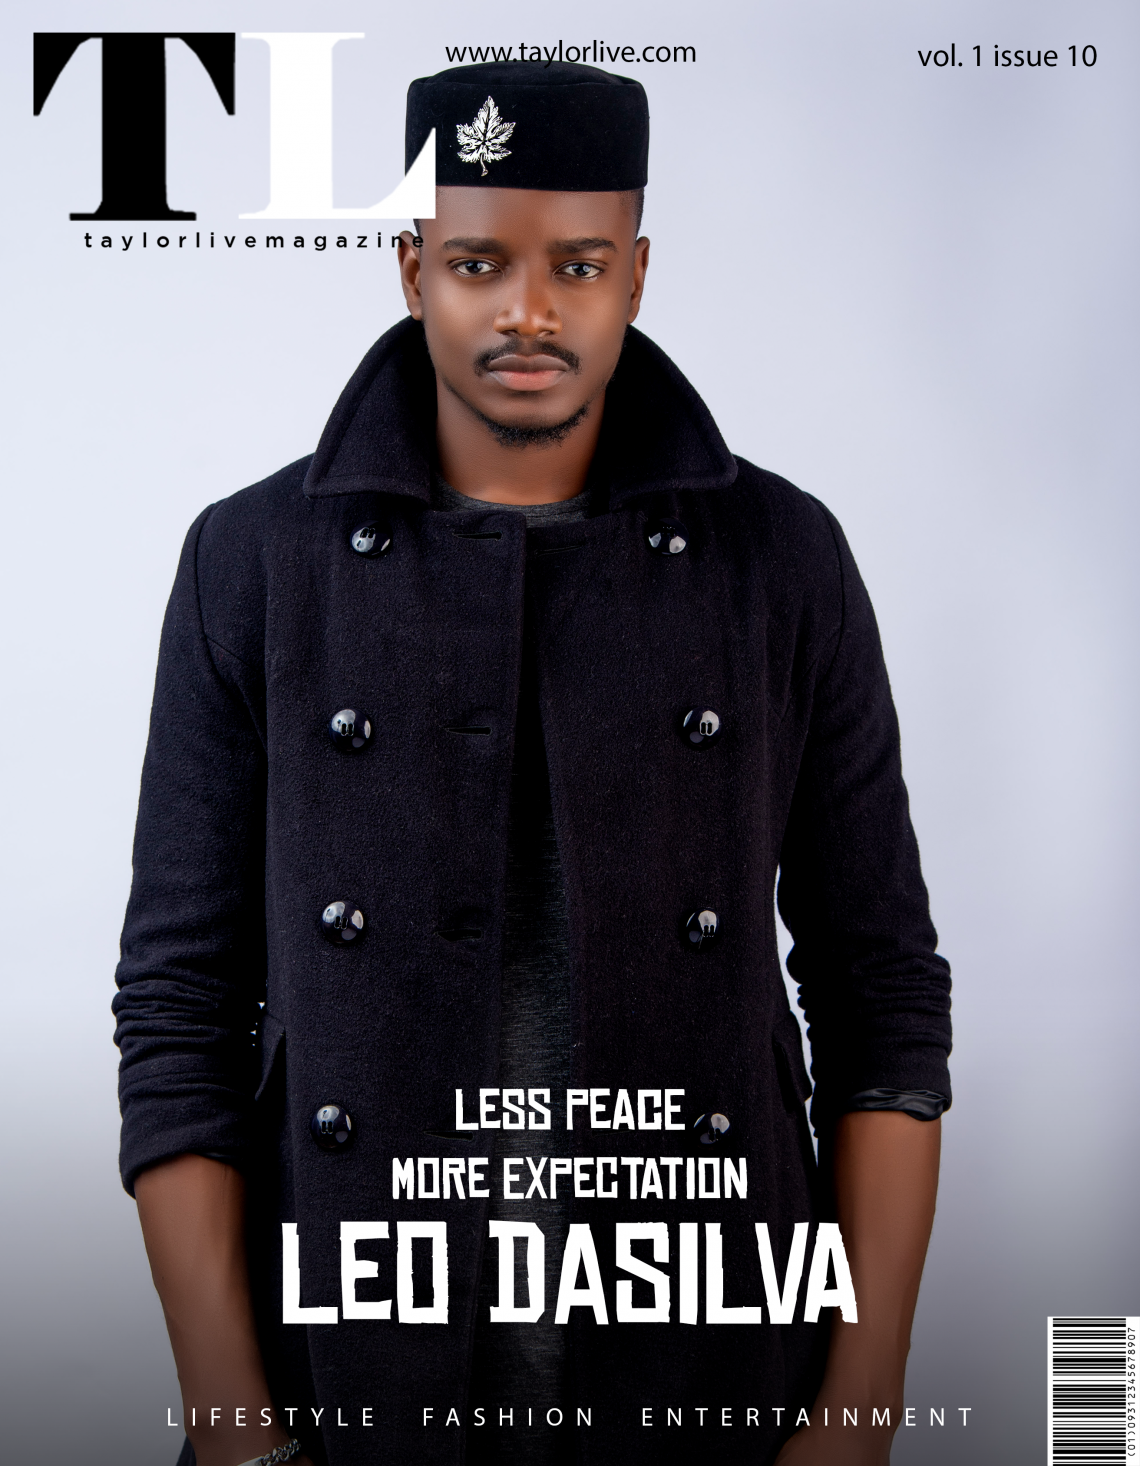 LESS PEACE MORE EXPECTATION! Leo Dasilva Covers Taylor Live Magazine's Latest Issue